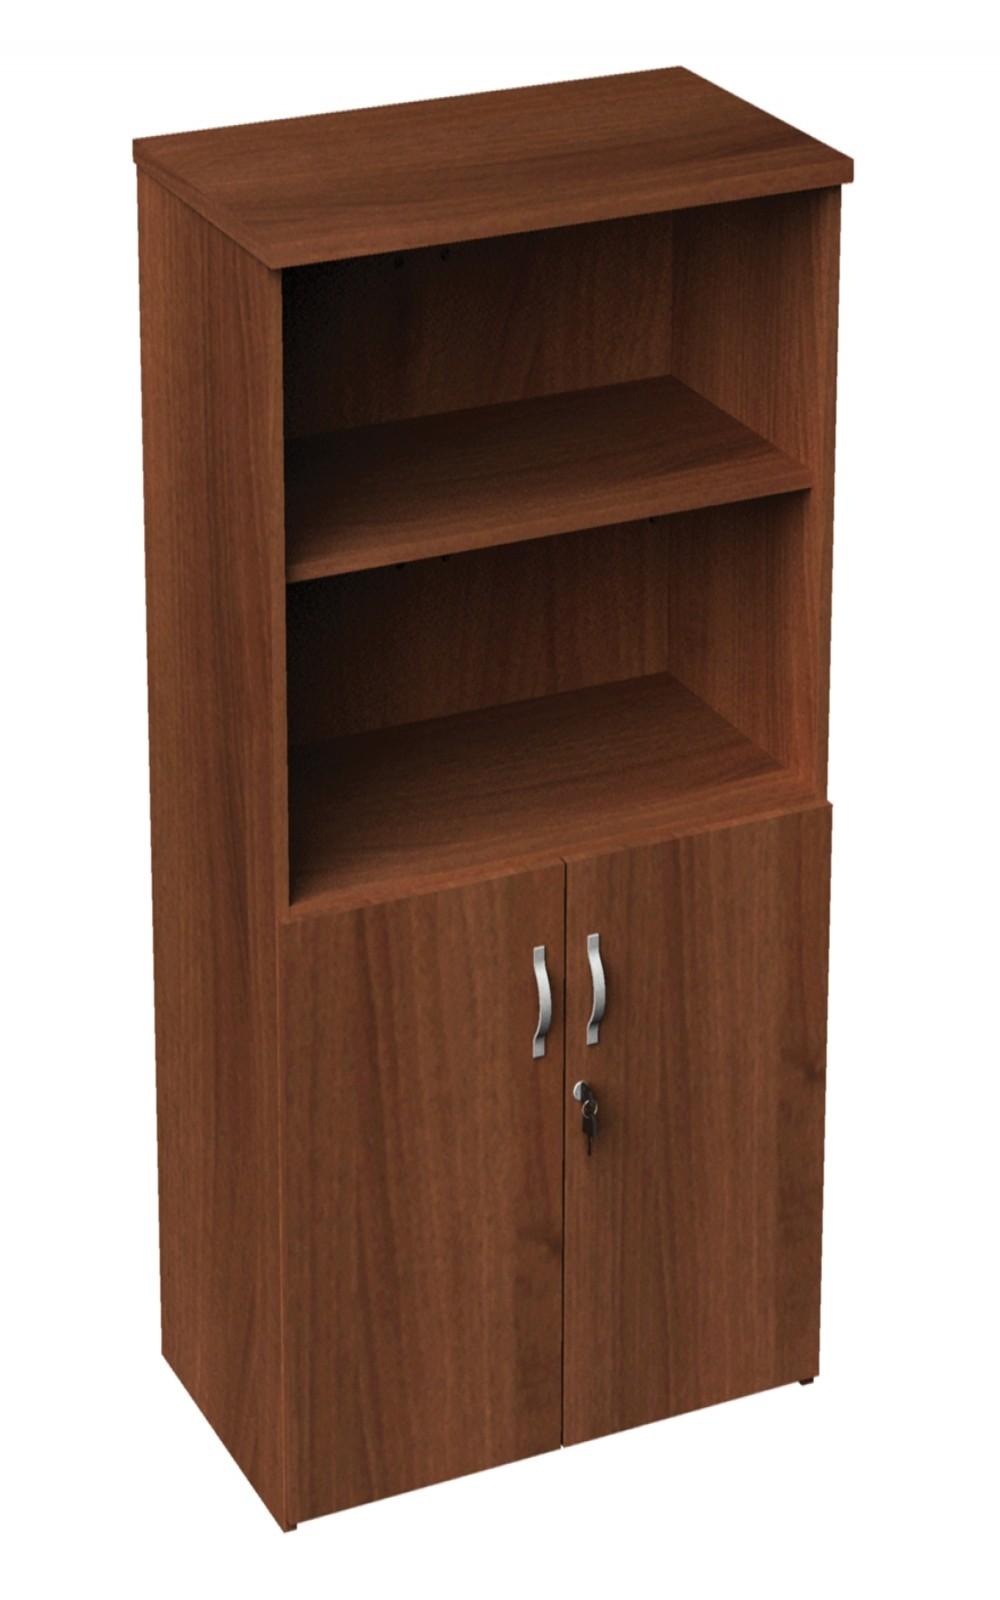 R1440op 1440mm tall combination unit r1440op 121 office furniture - Tall office desk ...